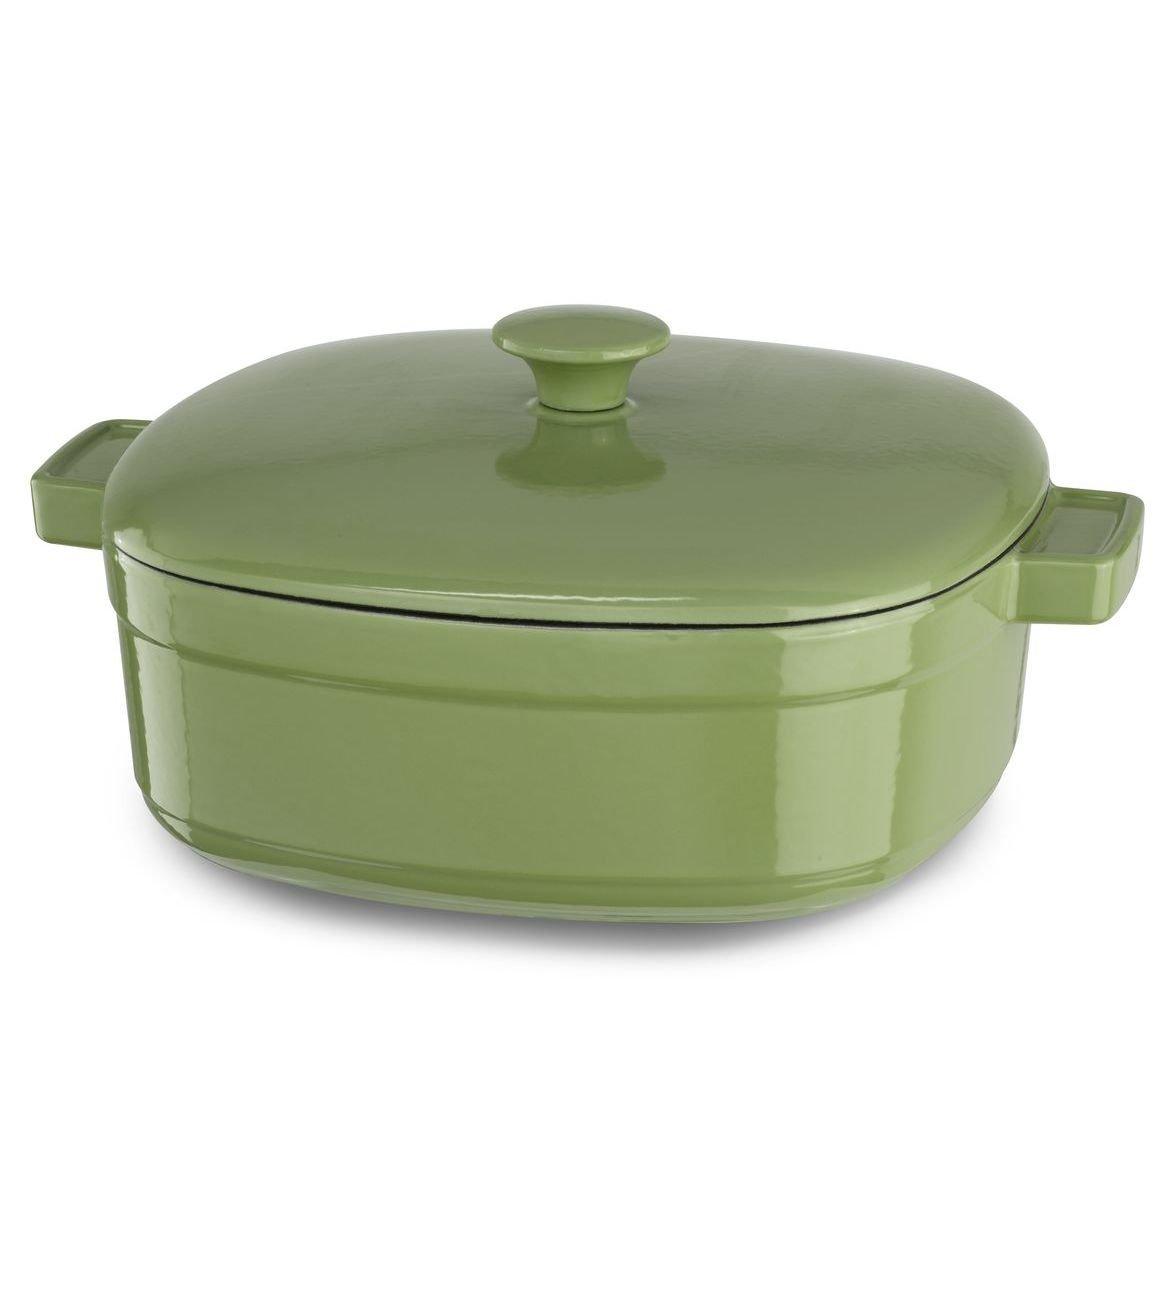 Kitchenaid Dutch Oven kitchen aid cast iron 3-qt. casserole dish   ebay